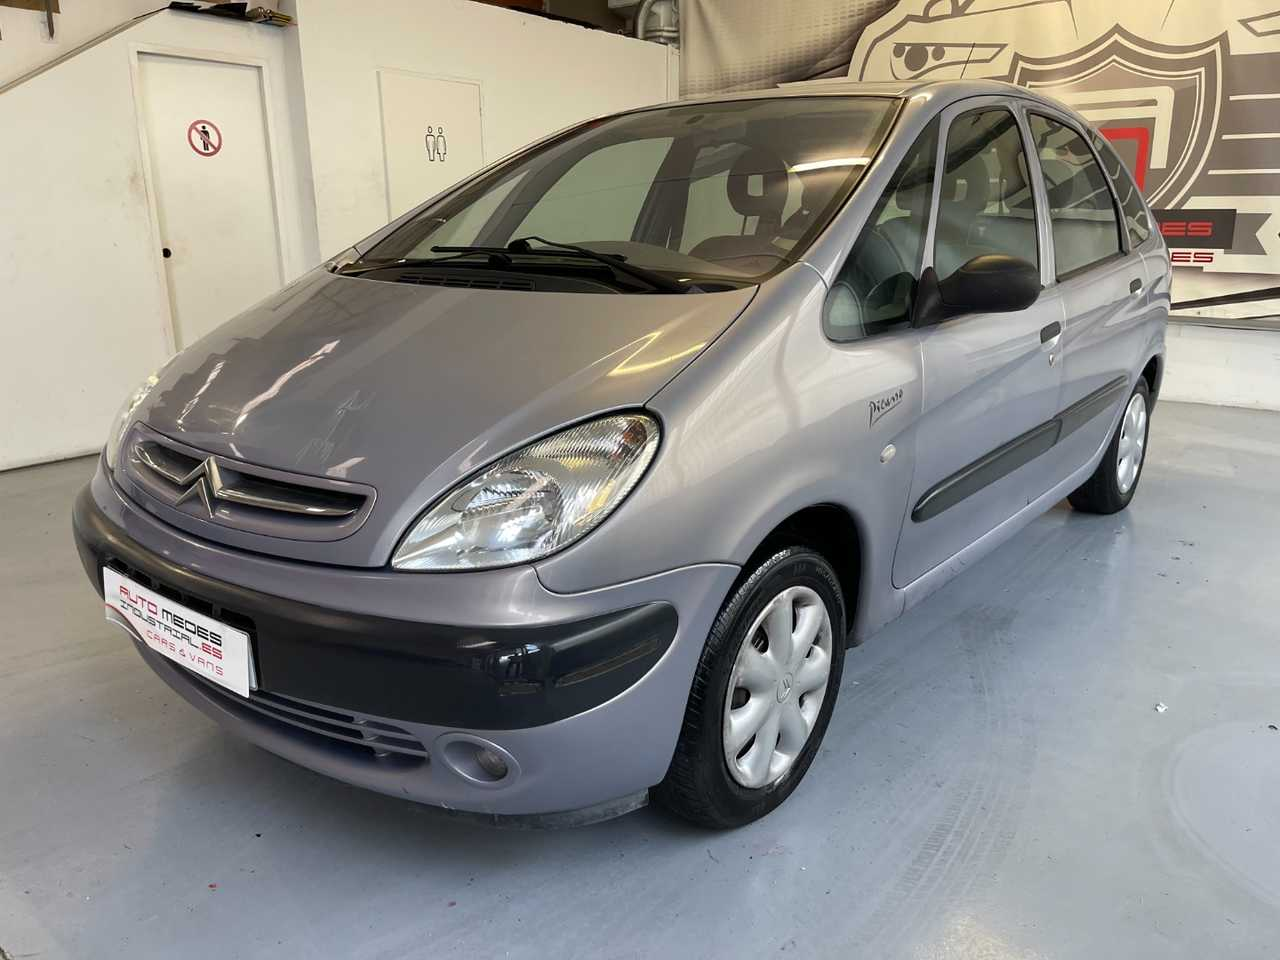 Citroën C4 Picasso 1.6i   - Foto 1